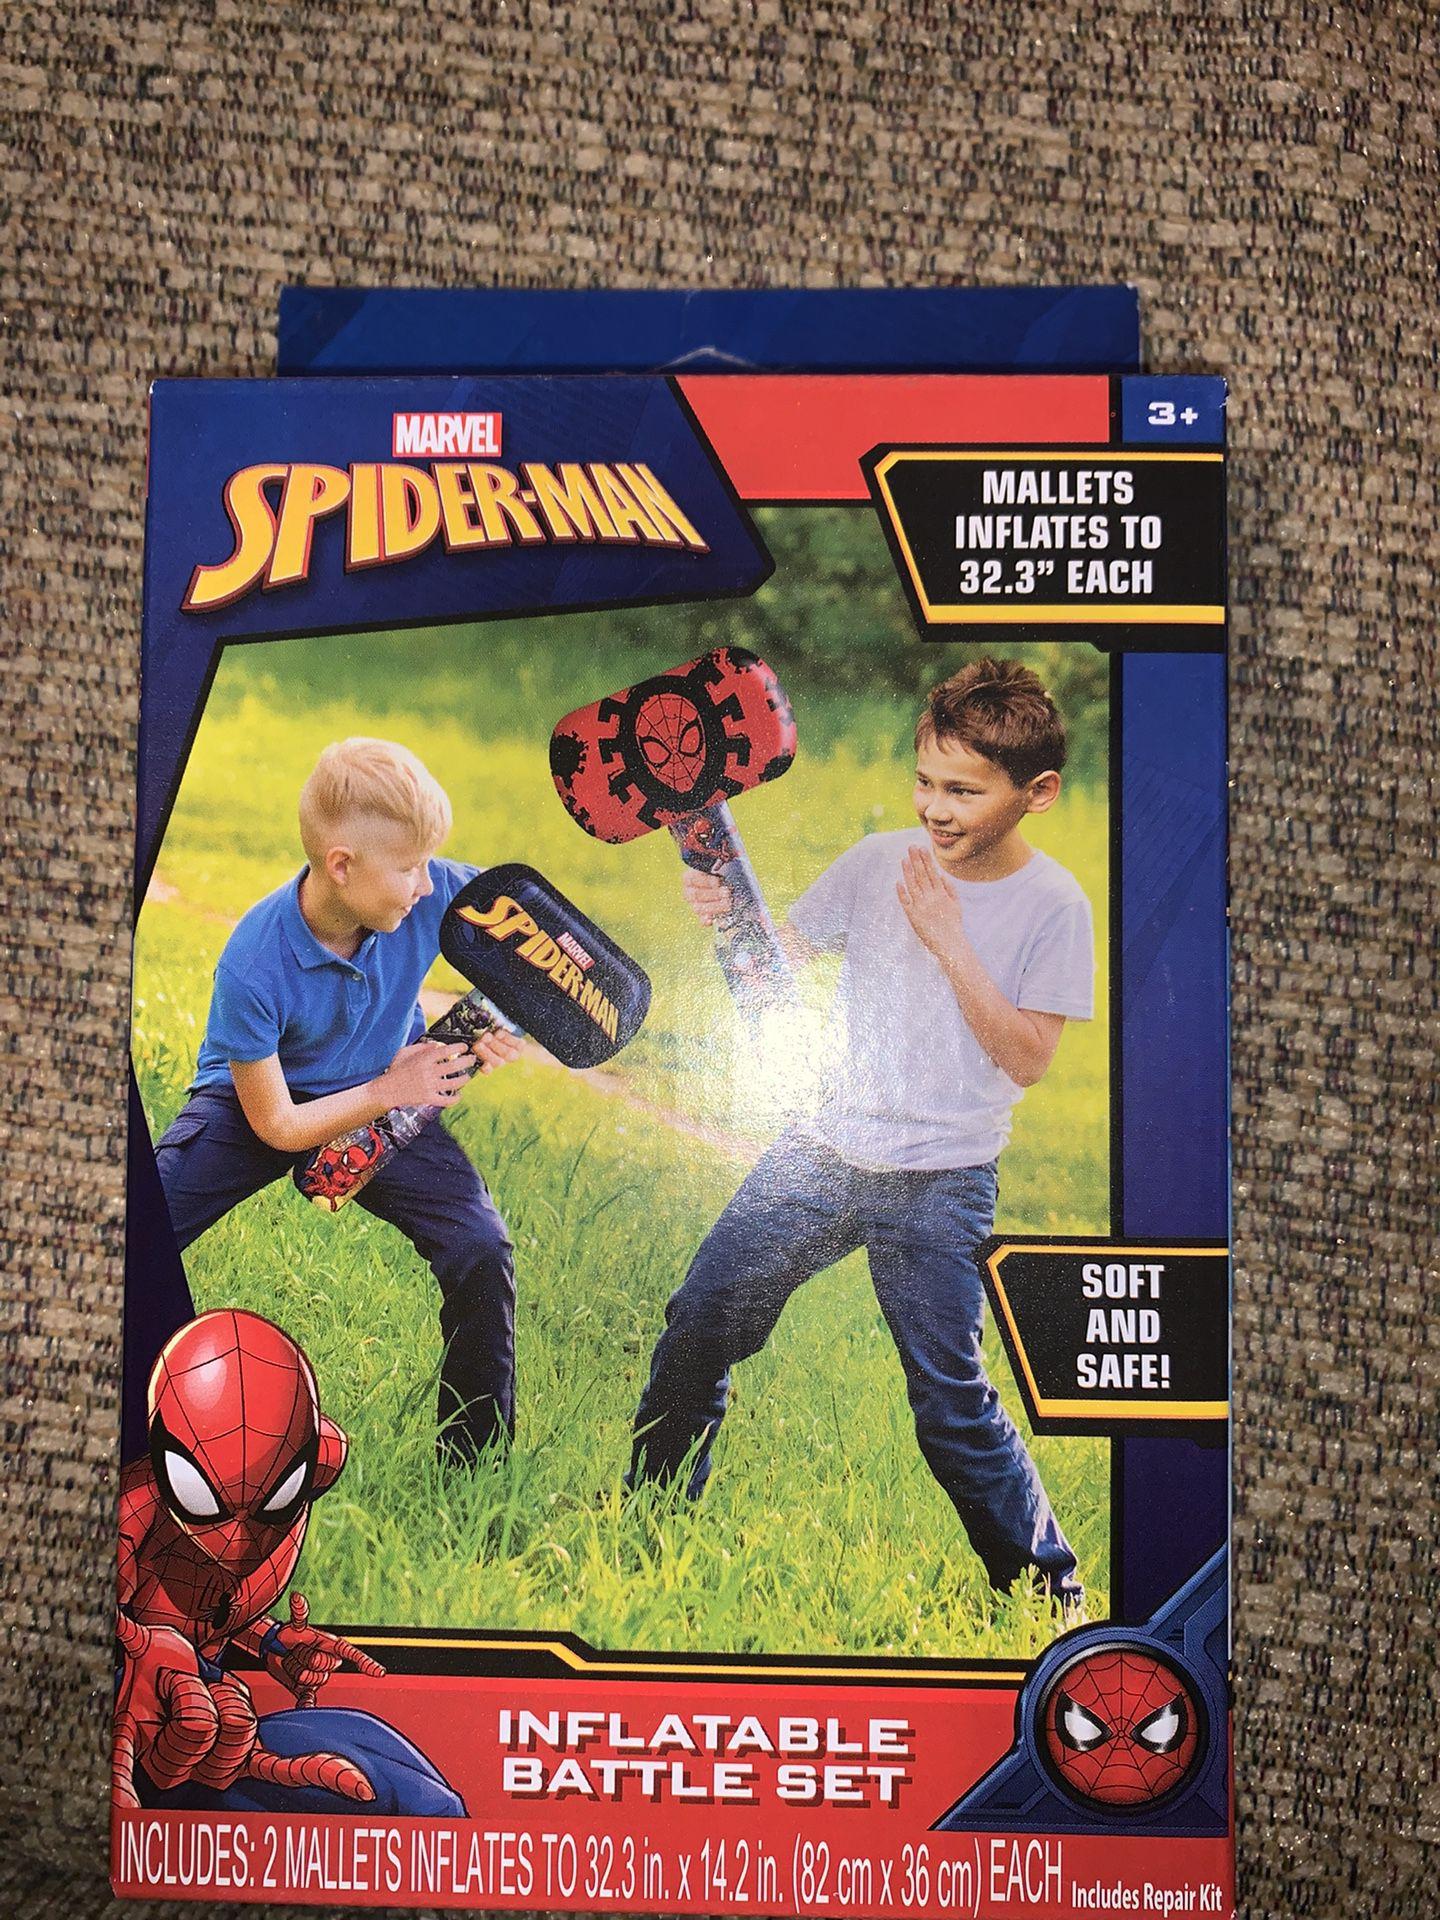 Inflatable Battle Set